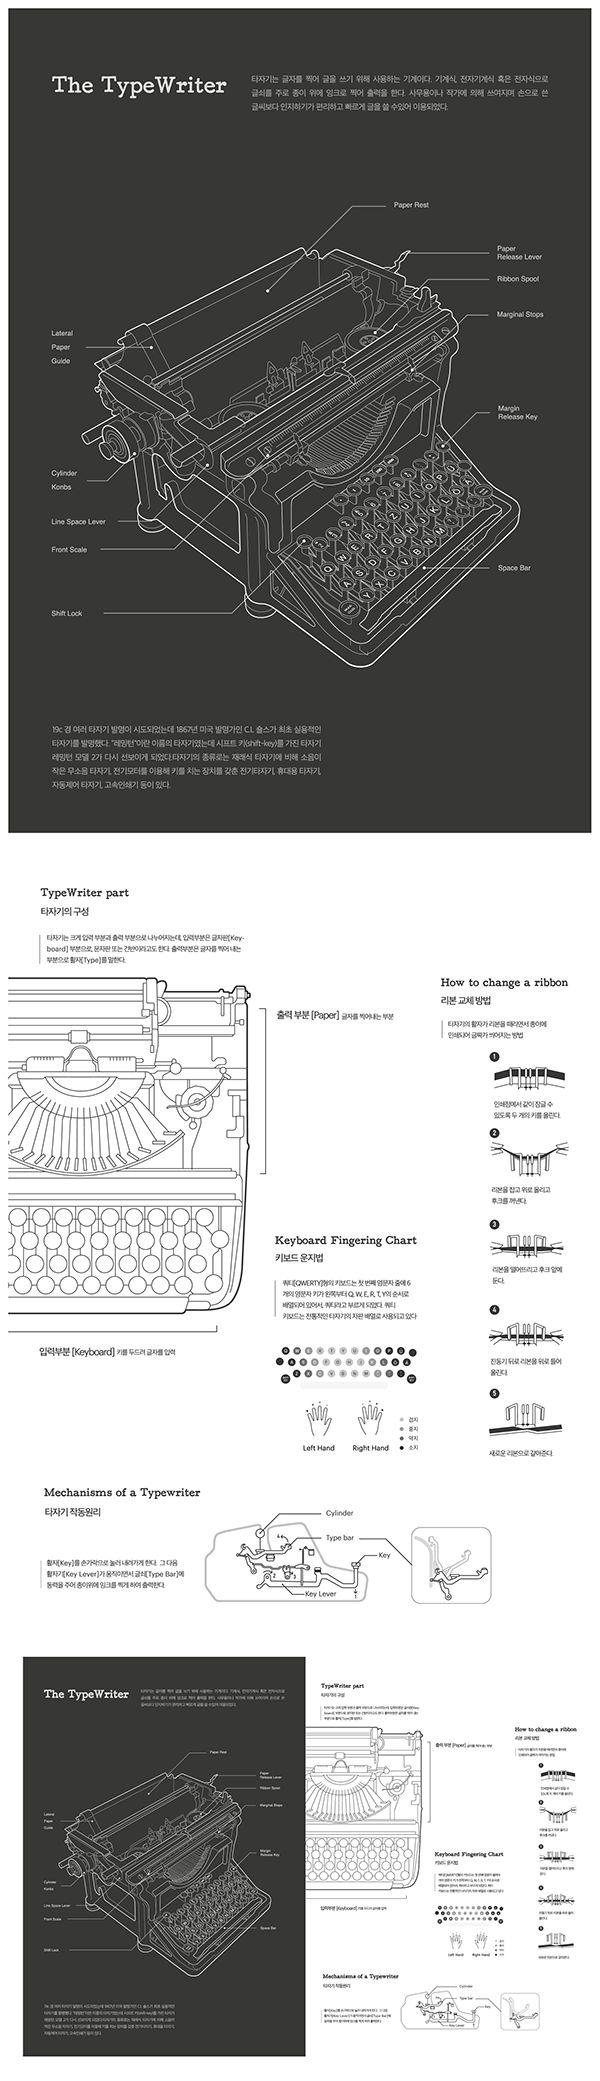 Ha Neul bit │ Information Design 2015│ Major in Digital Media Design │#hicoda │hicoda.hongik.ac.kr